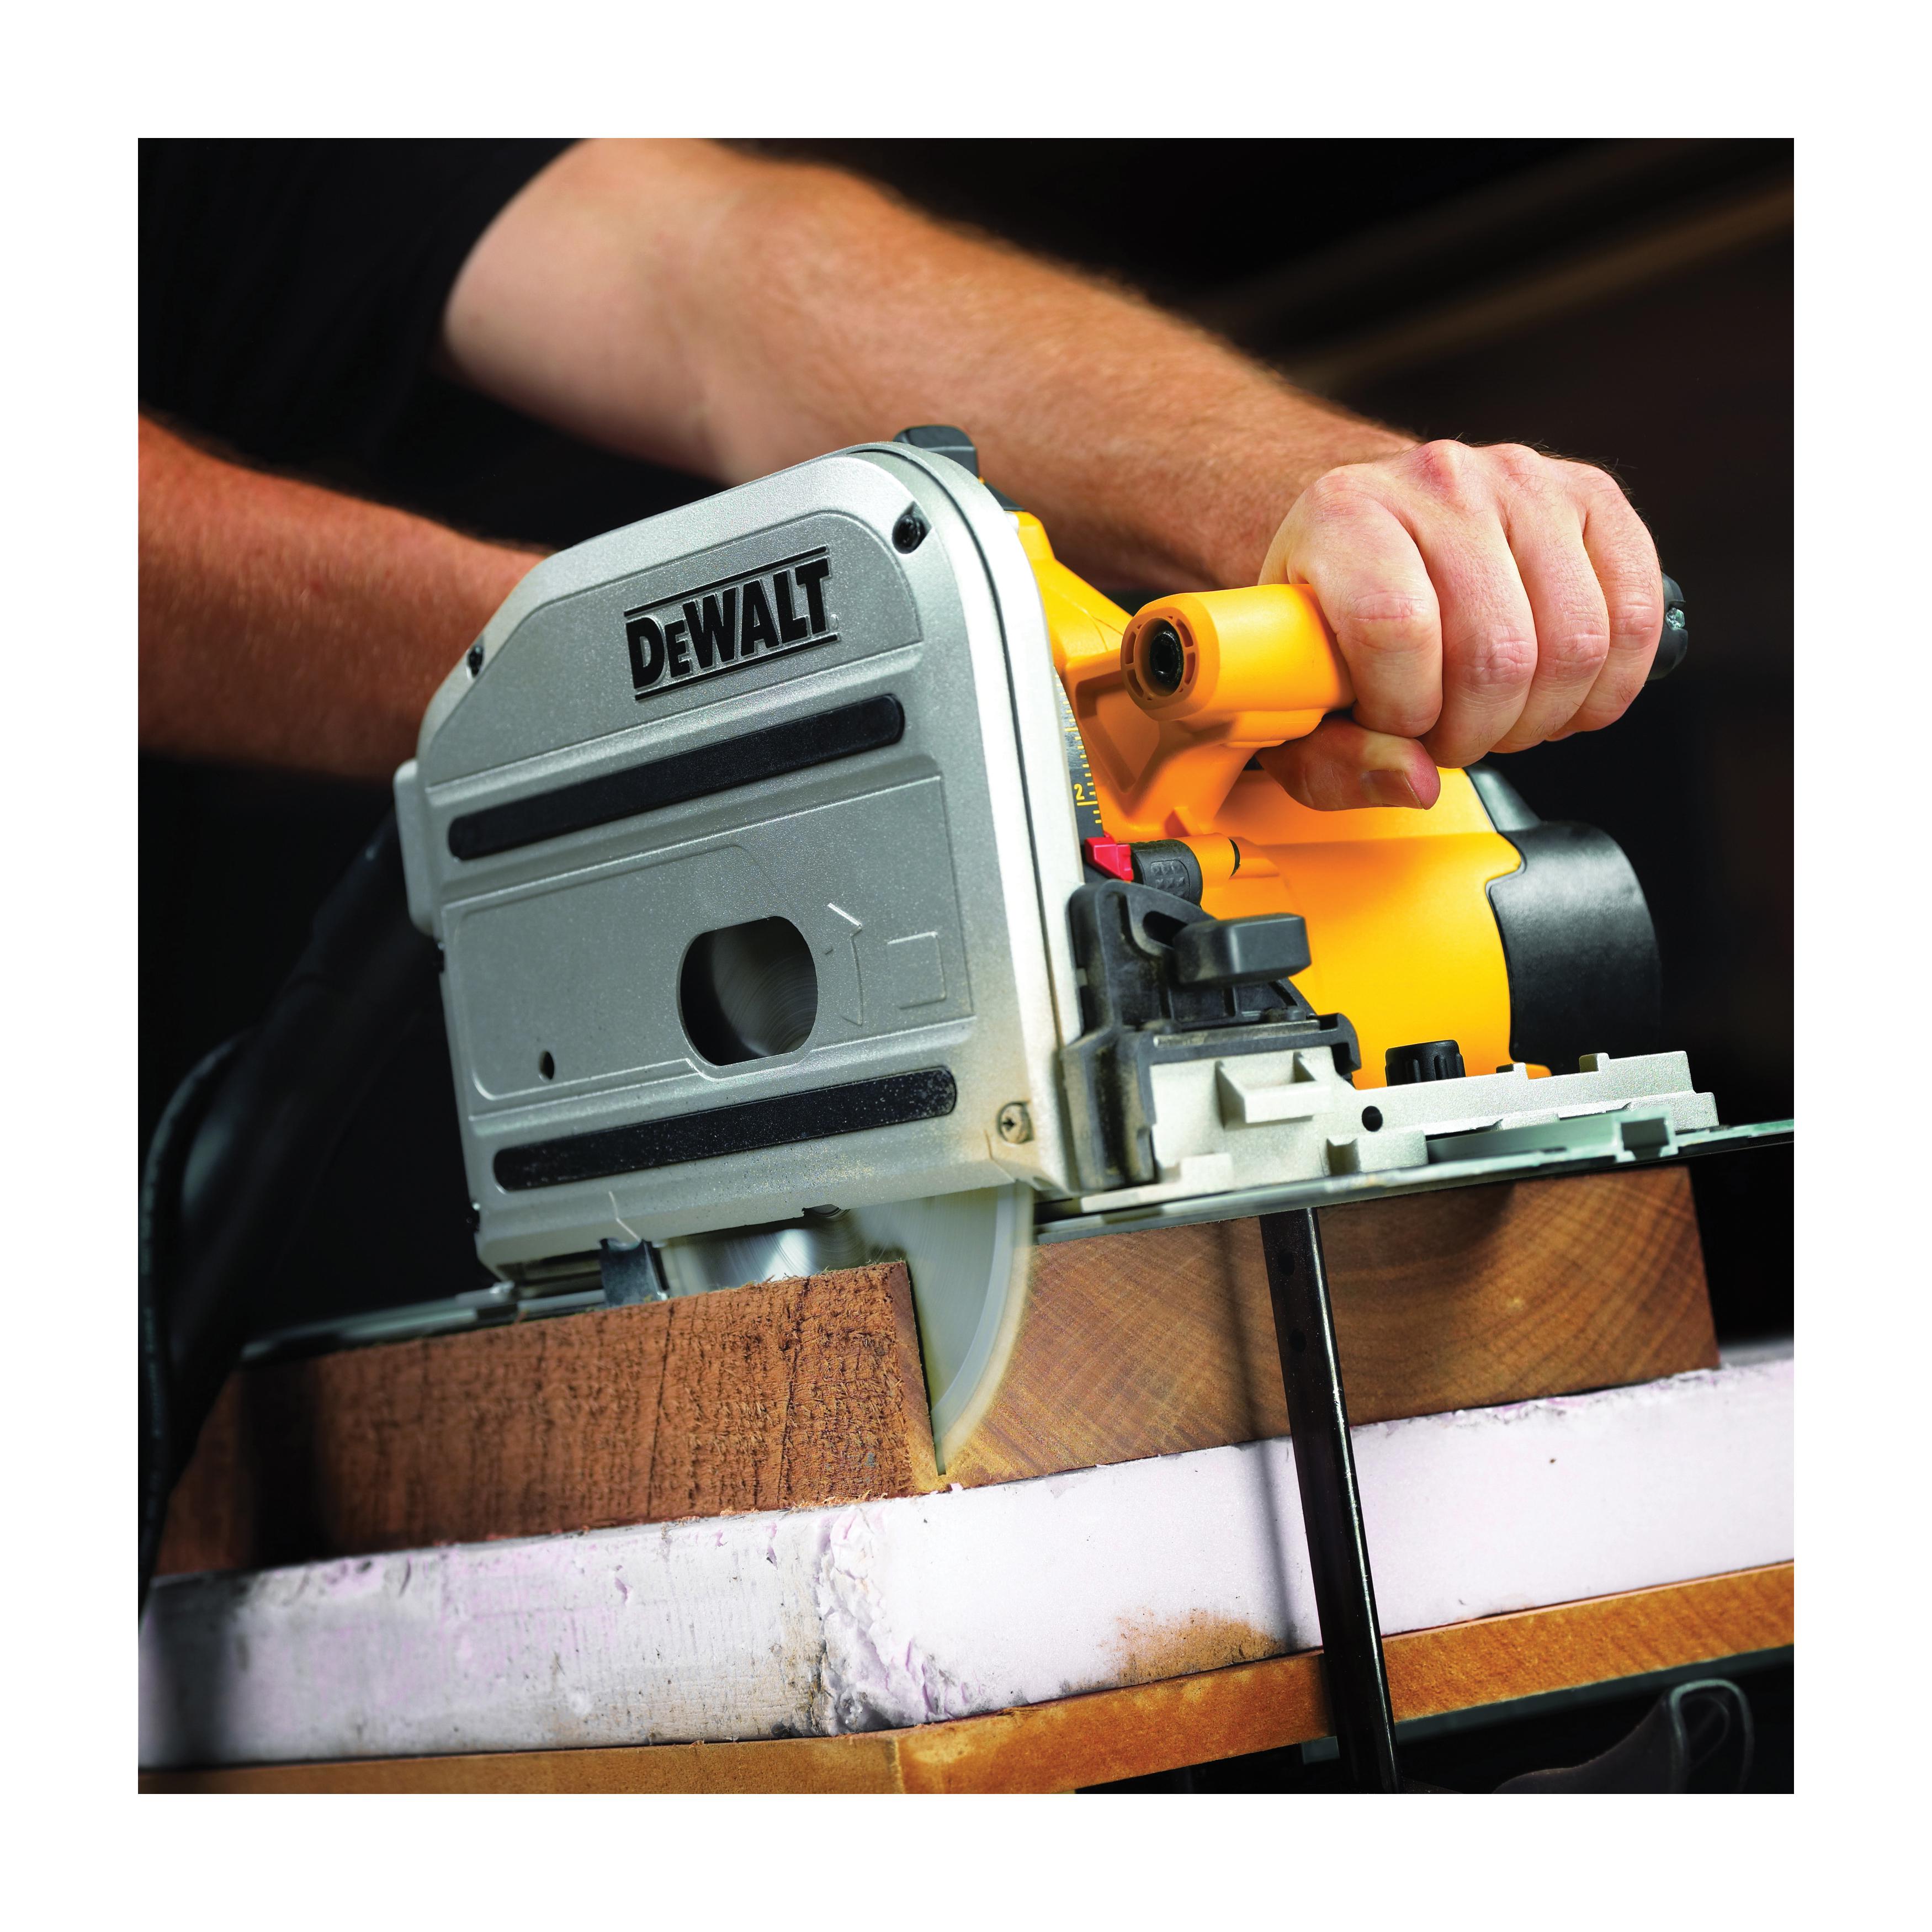 DeWALT® DWS520CK Heavy Duty Track Saw Kit, 6-1/2 in Blade, 1750 to 4000 rpm Speed, 12 A